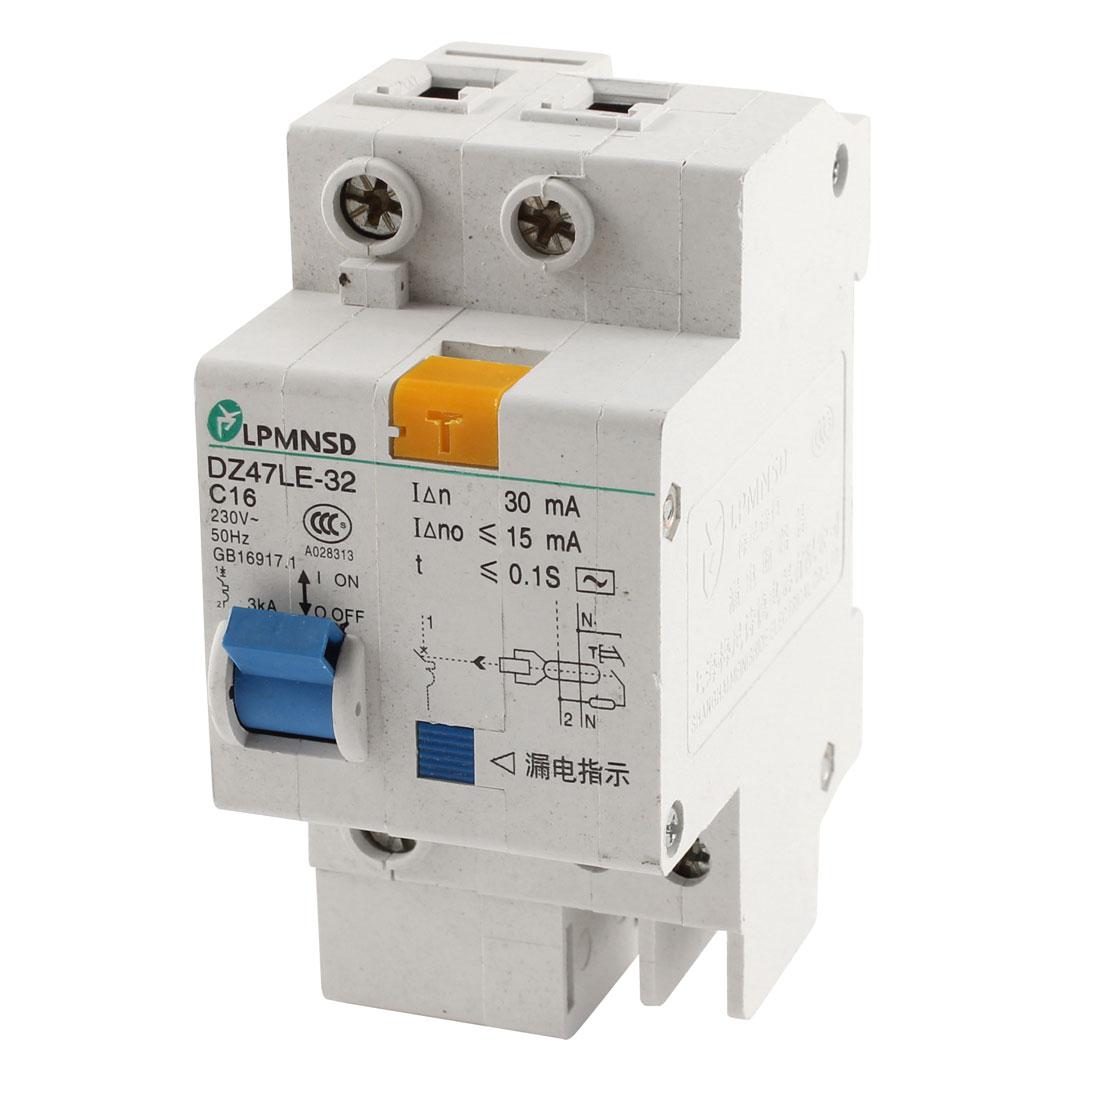 AC 230V 16A DIN Dail 1P Overload Proetction Circuit Breaker DZ47LE-32 C16